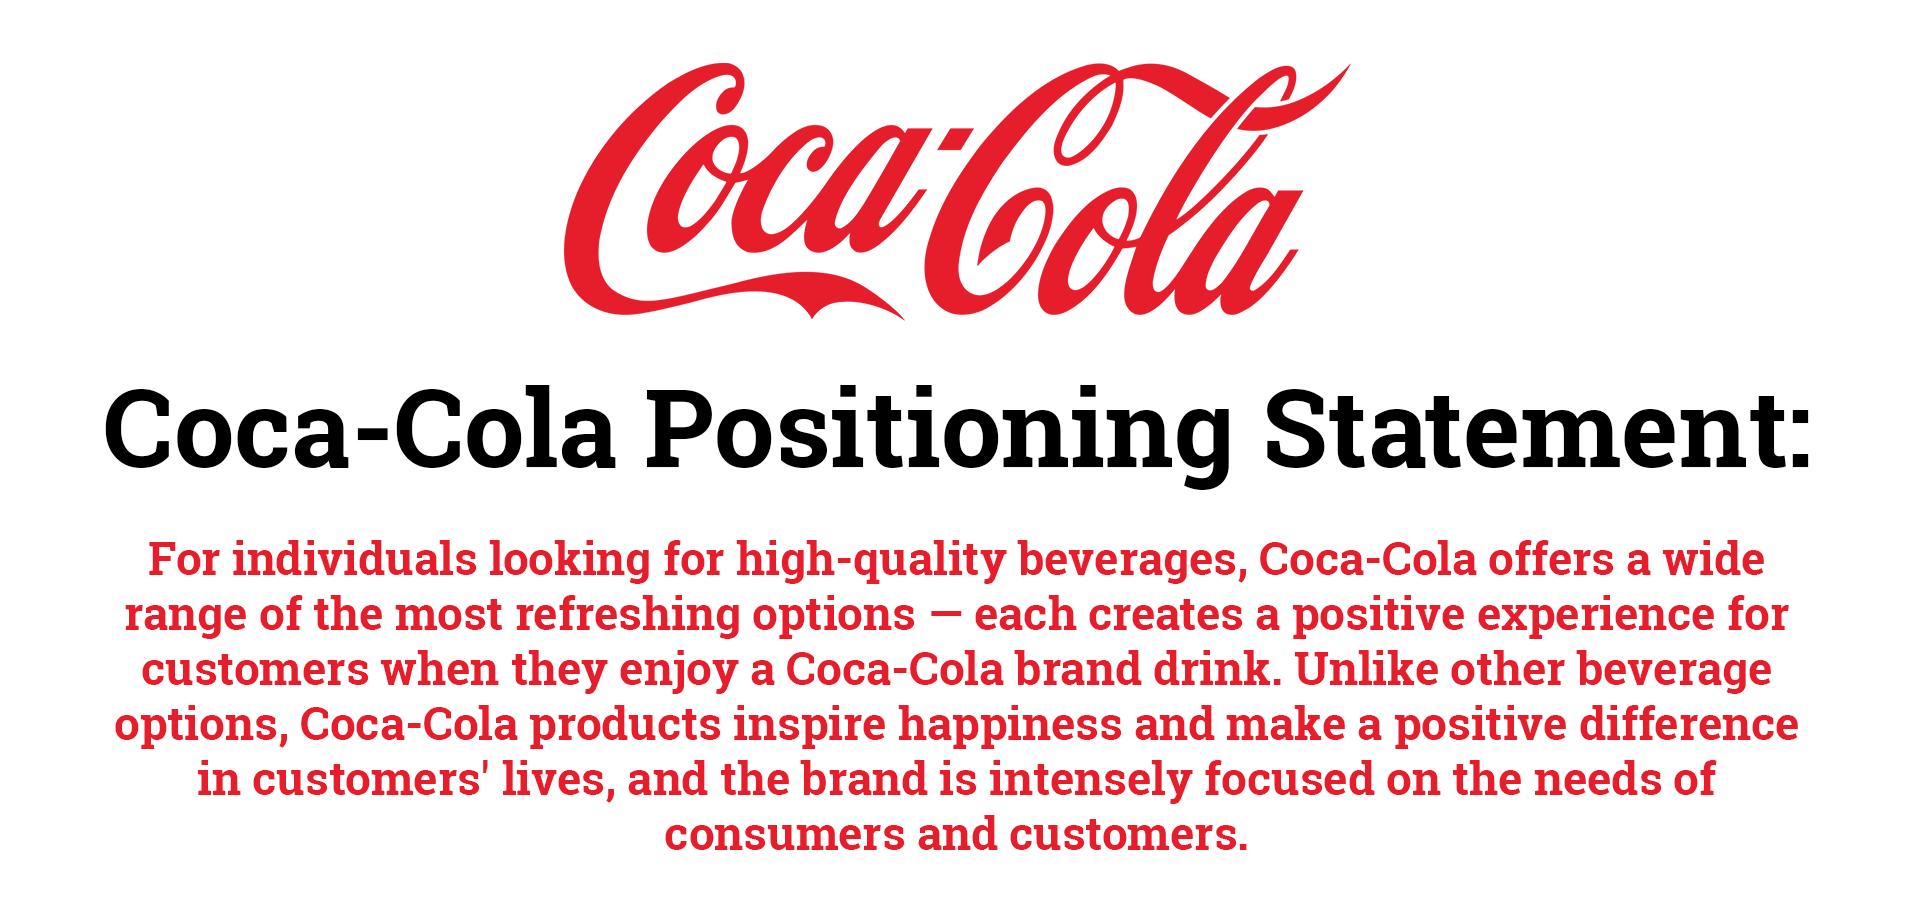 coca-cola positioning statement